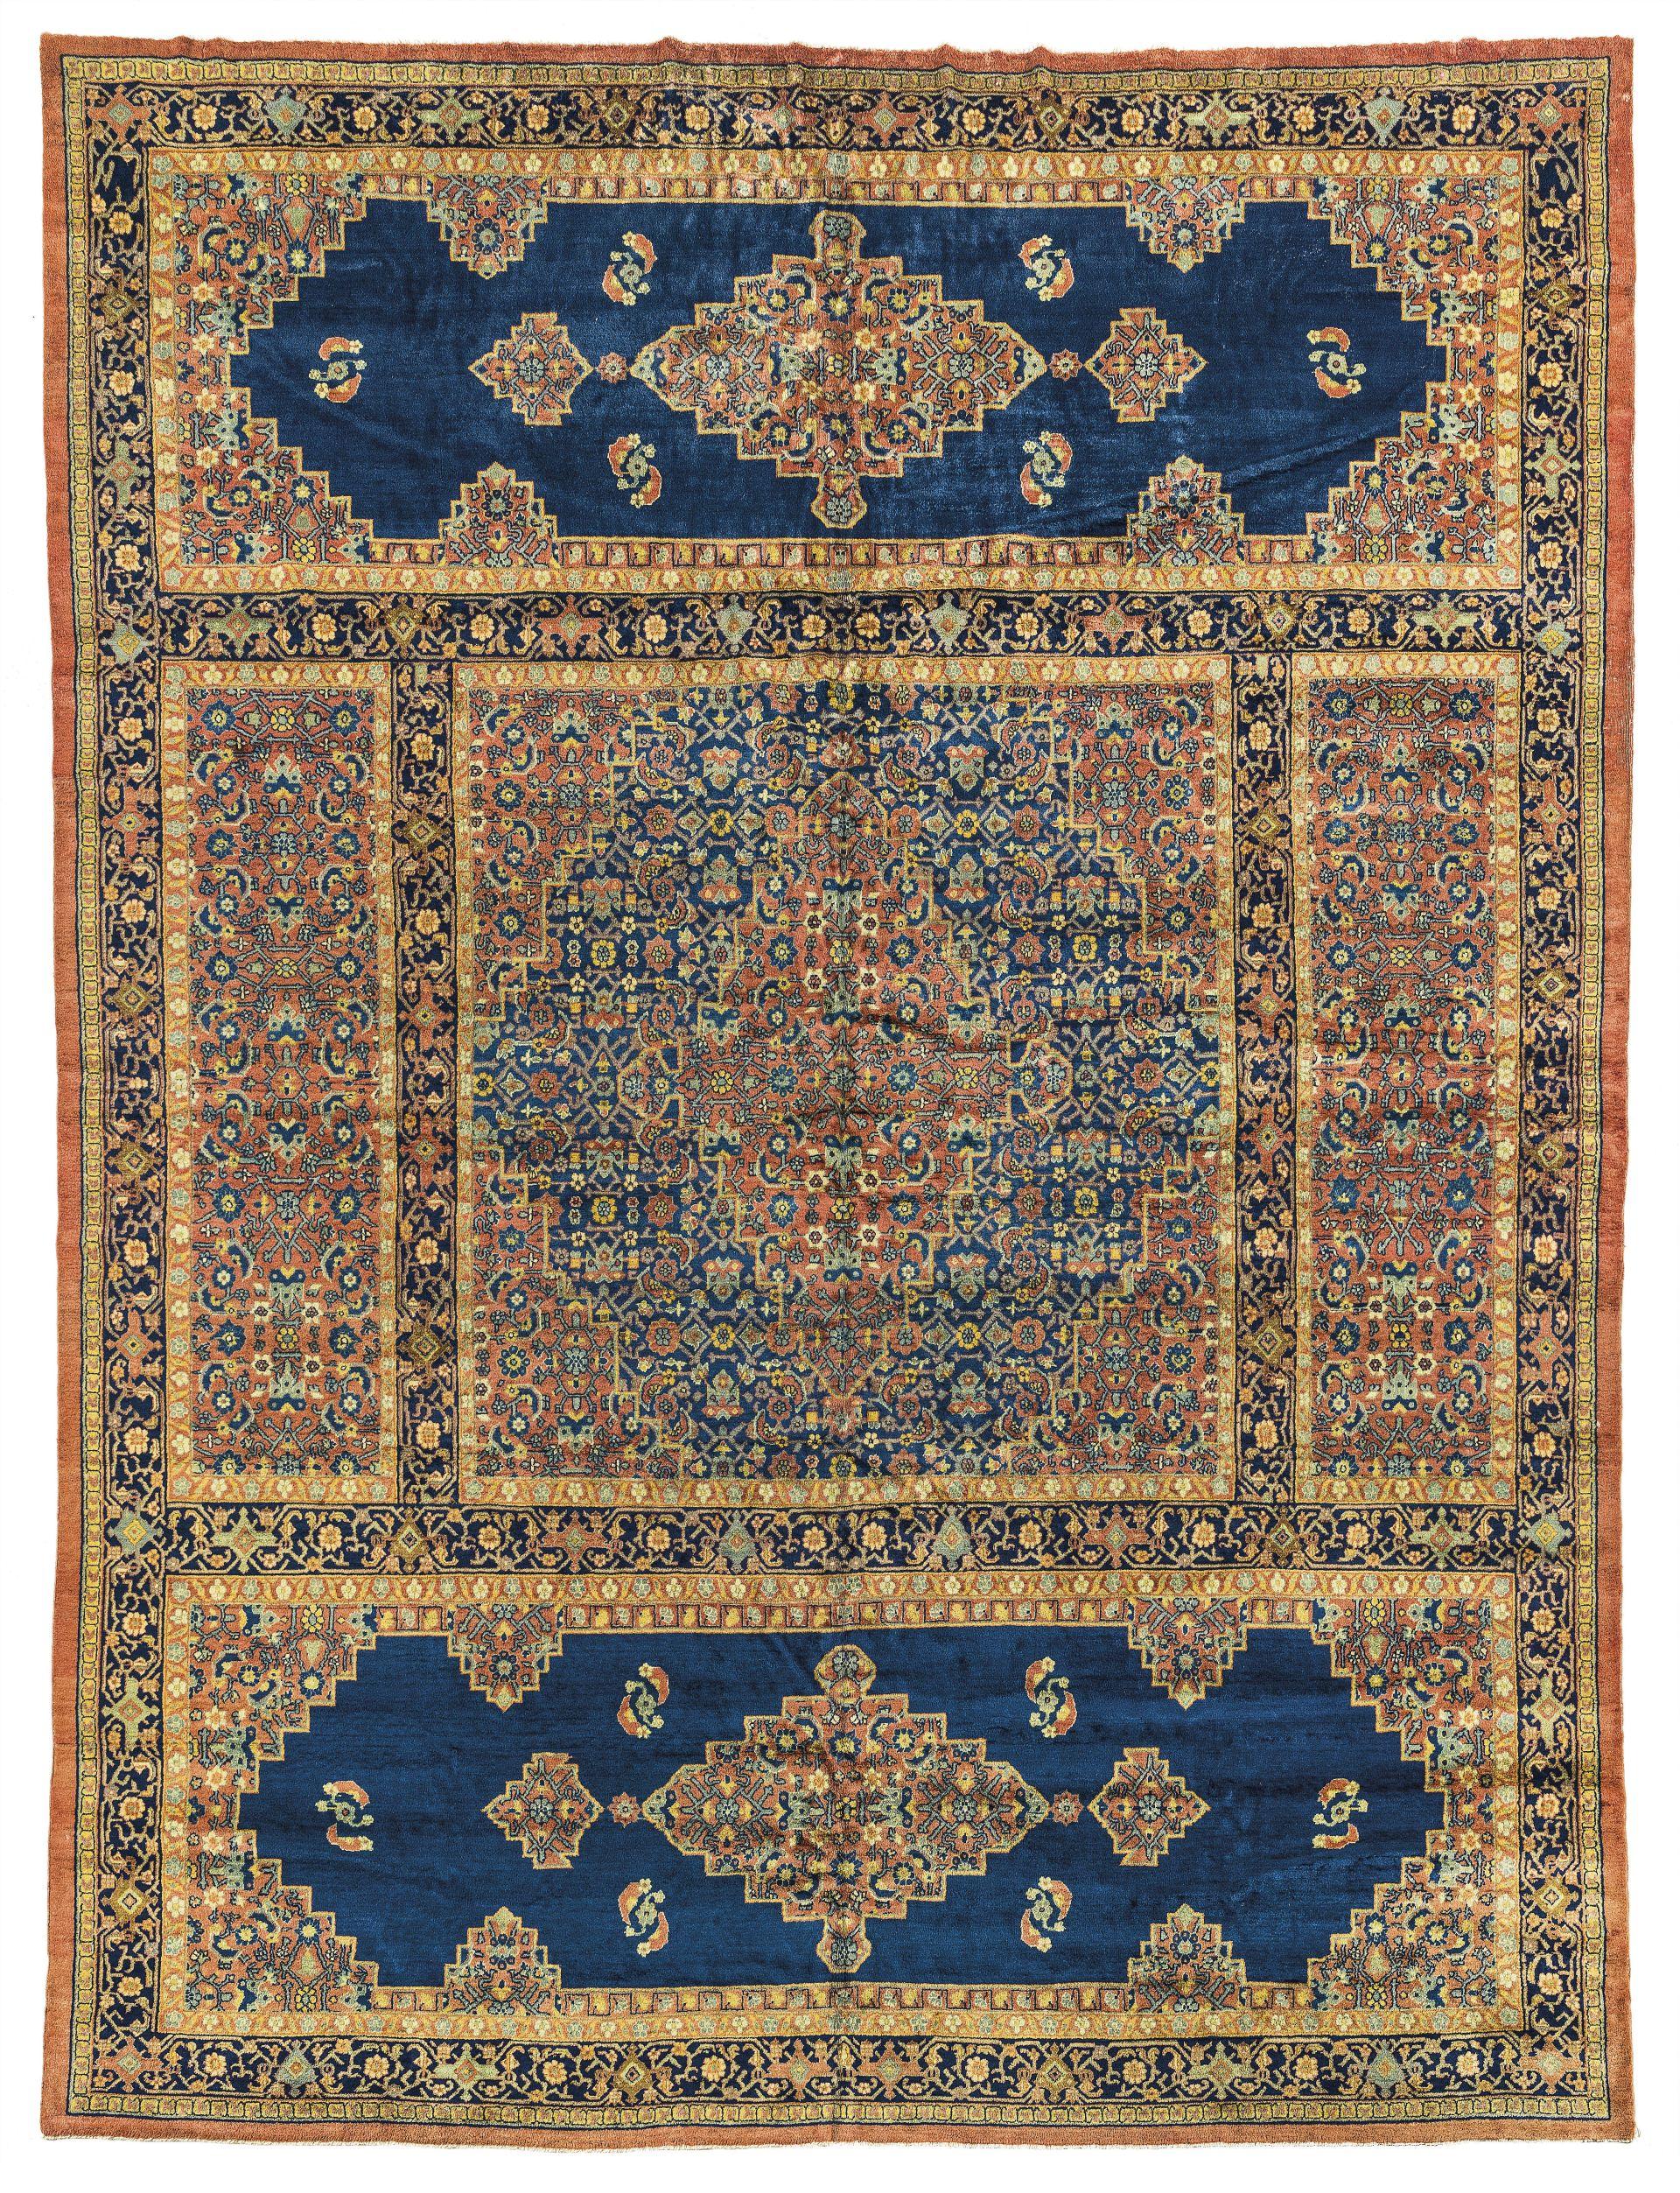 220469 Amritzar Triclinium IN 465x363 - Amritsar Triclinium